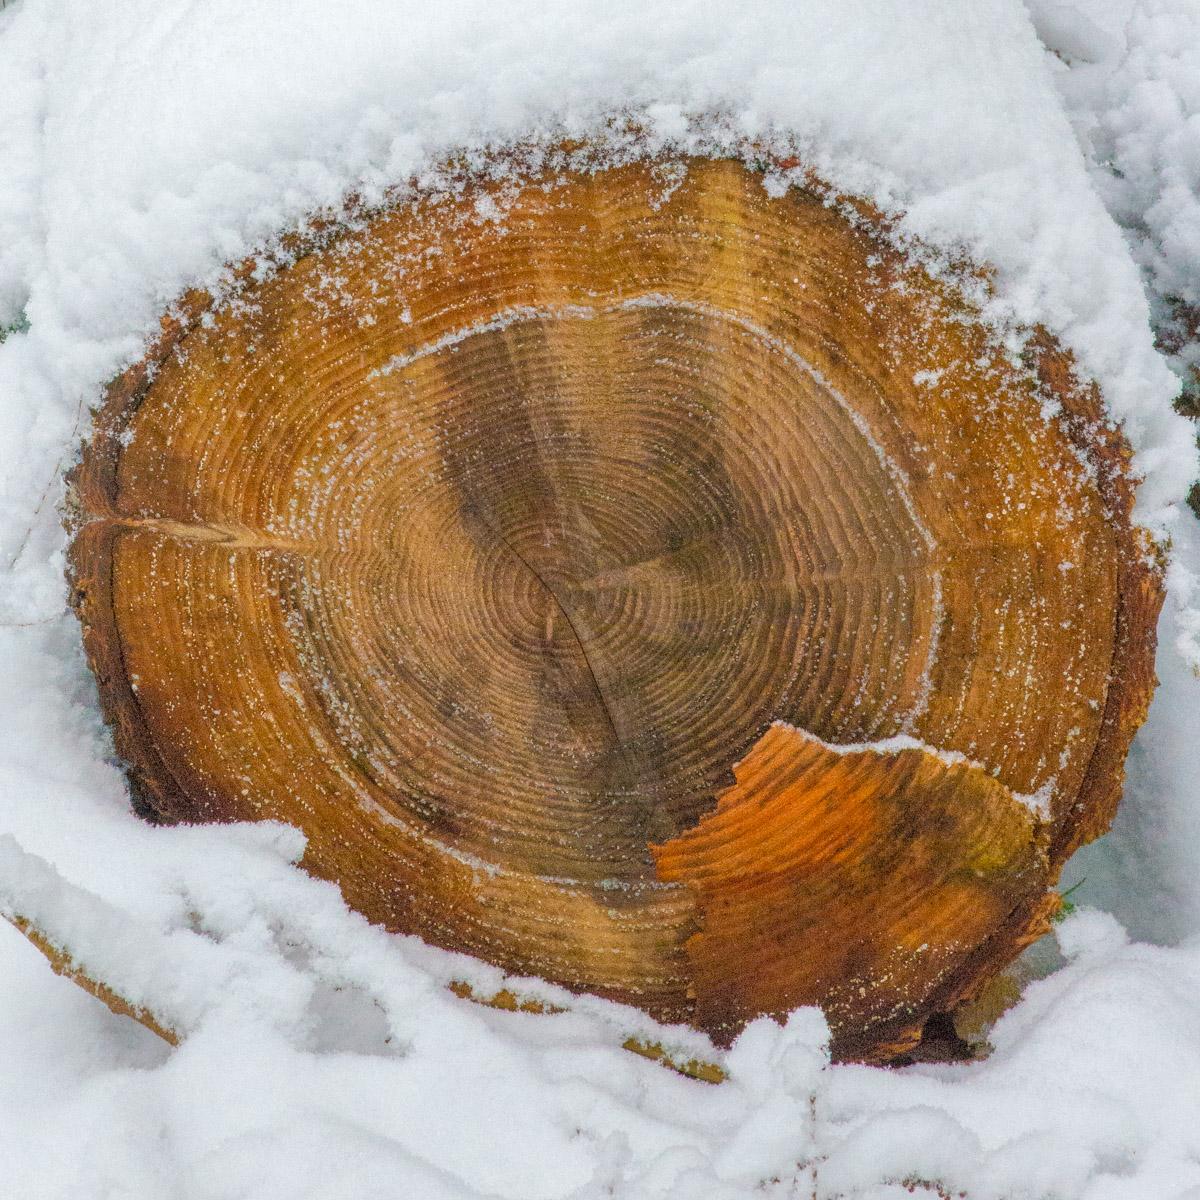 Trees-woodlands-snow-8901.jpg